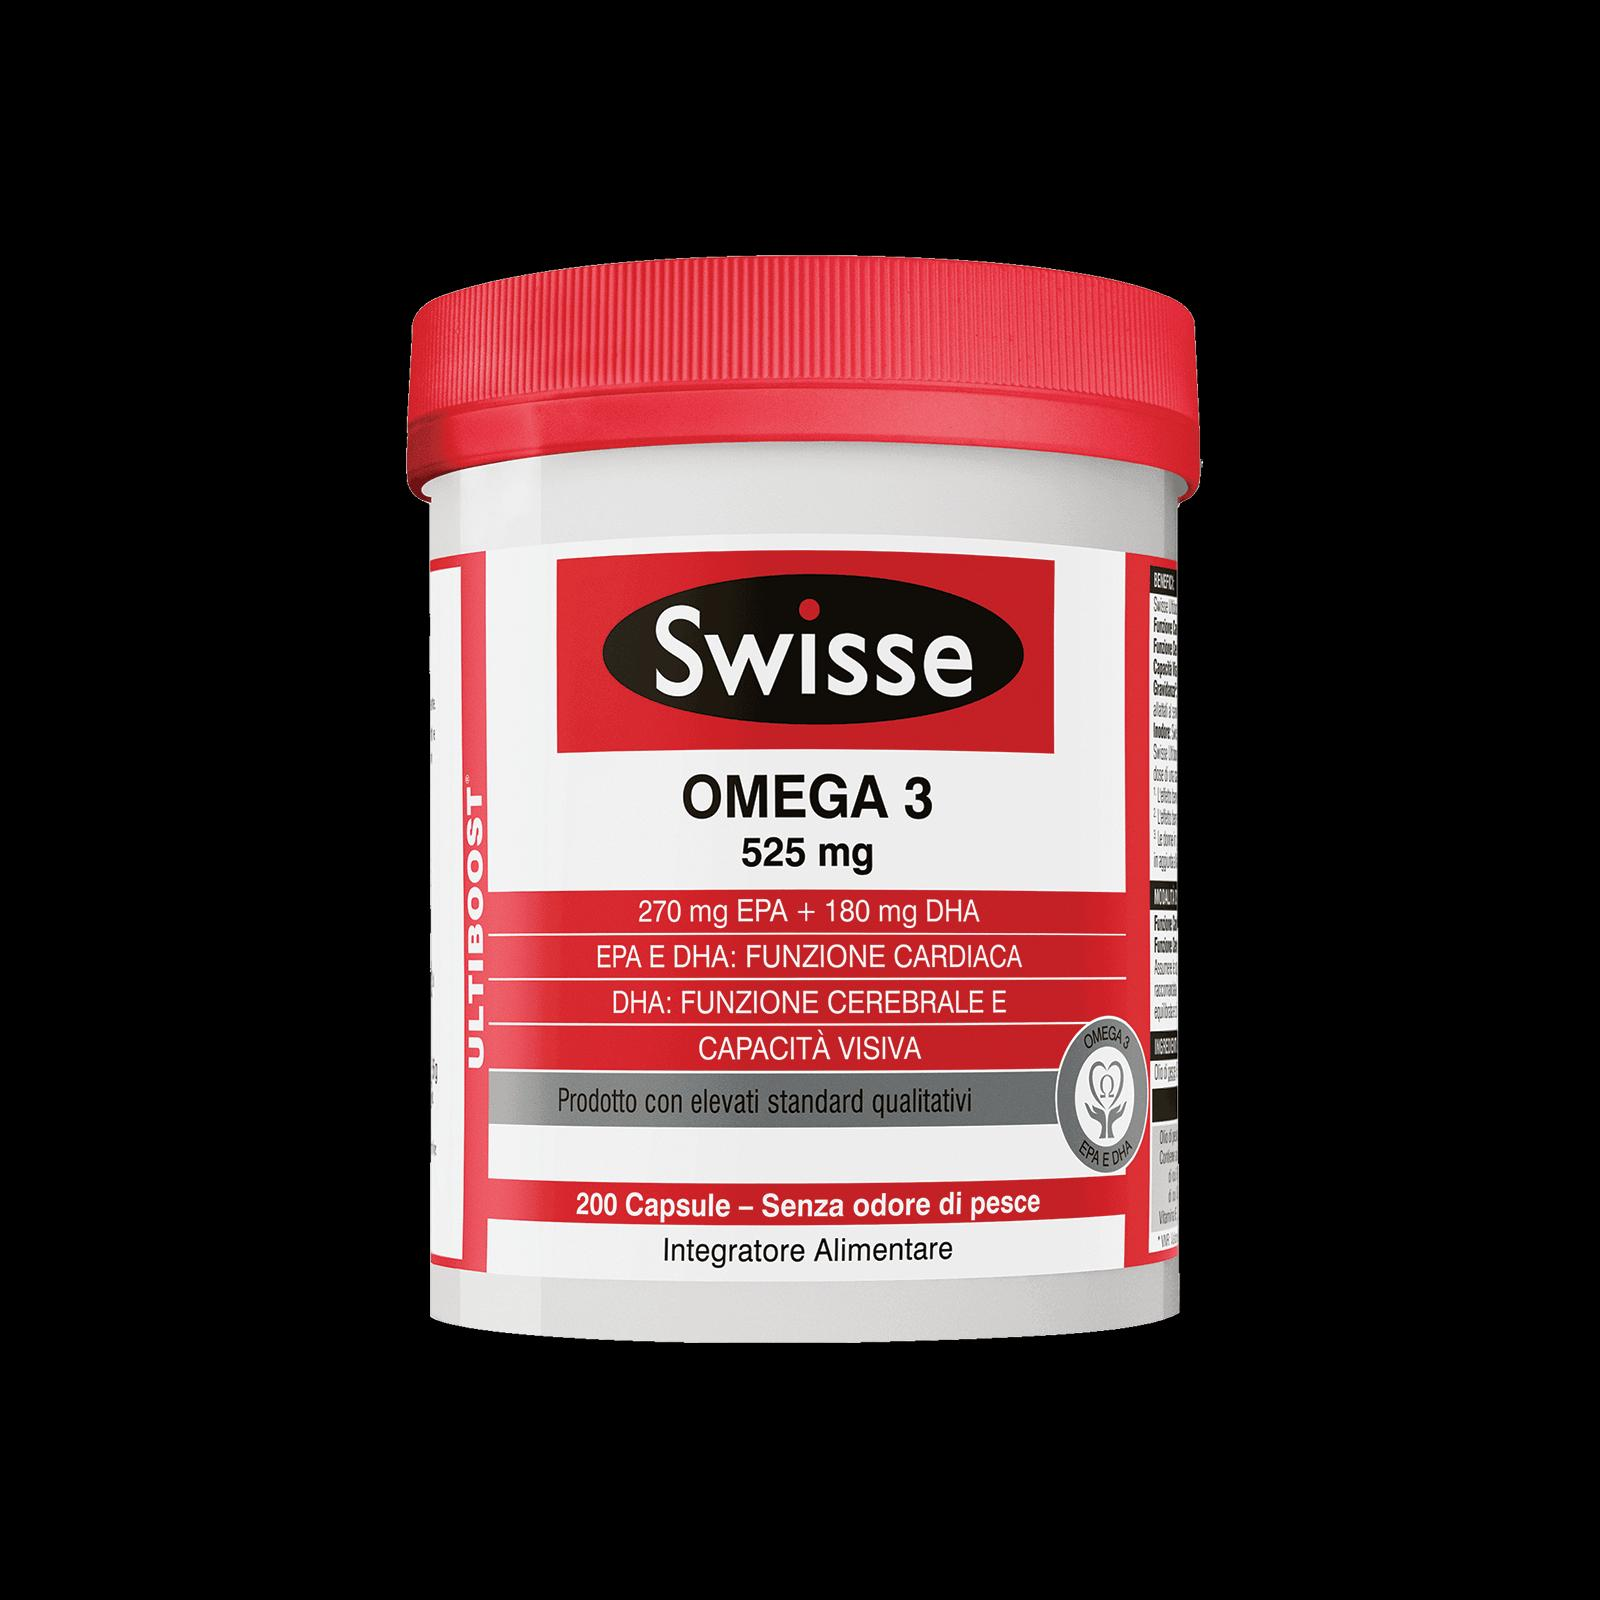 SWISSE OMEGA 3 - INTEGRATORE PER VISTA E CUORE 200 CAPSULE